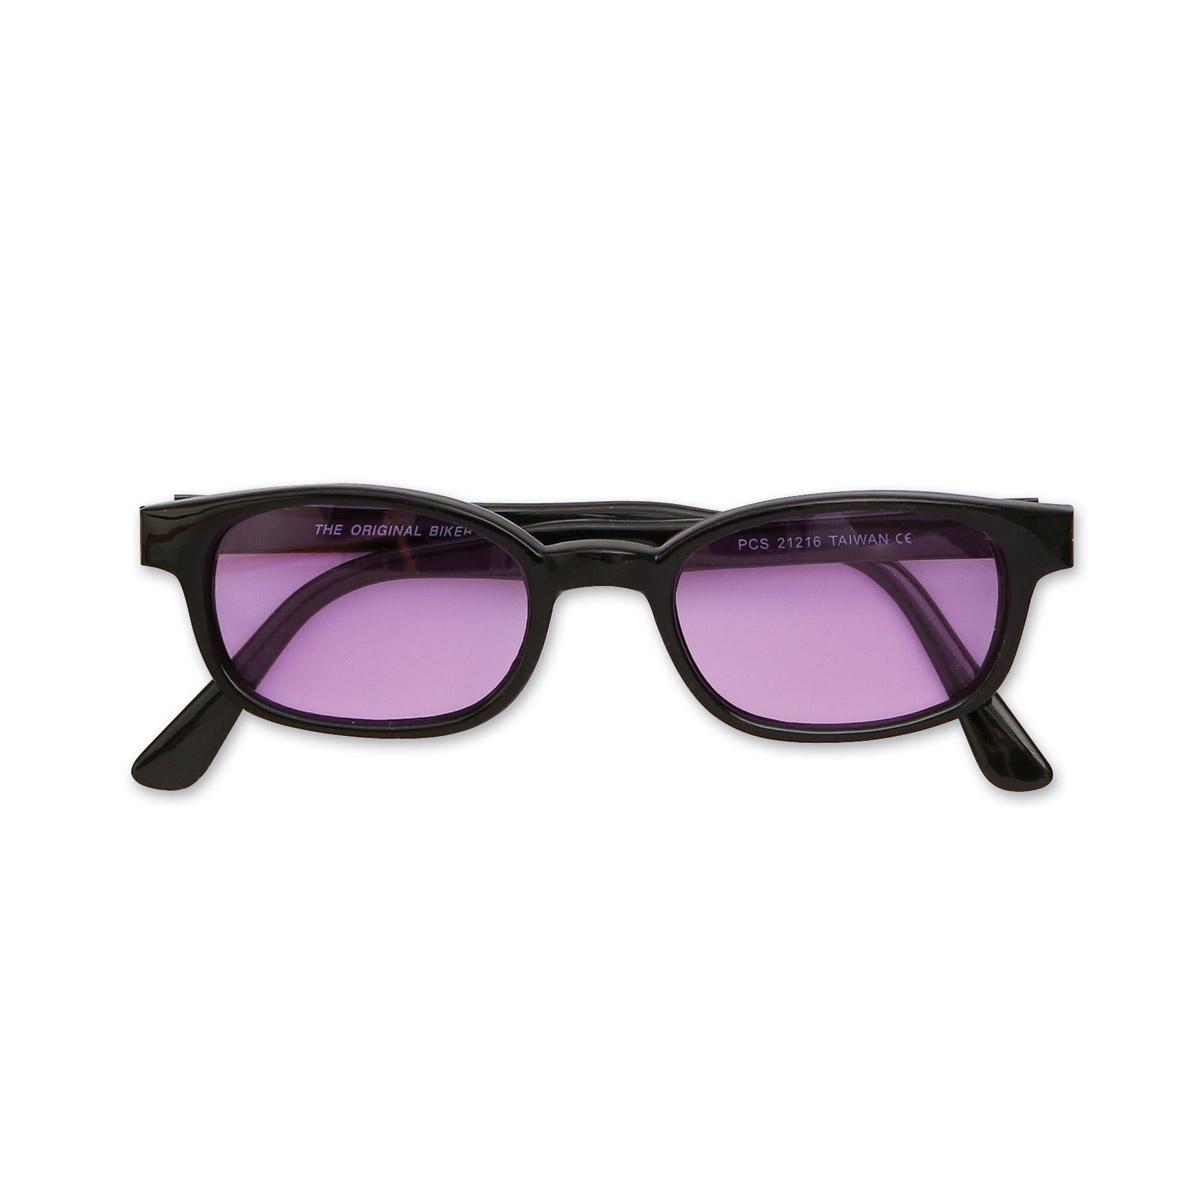 ecfb93c793 Original KD s Sunglasses-Black Frame with Purple Lens